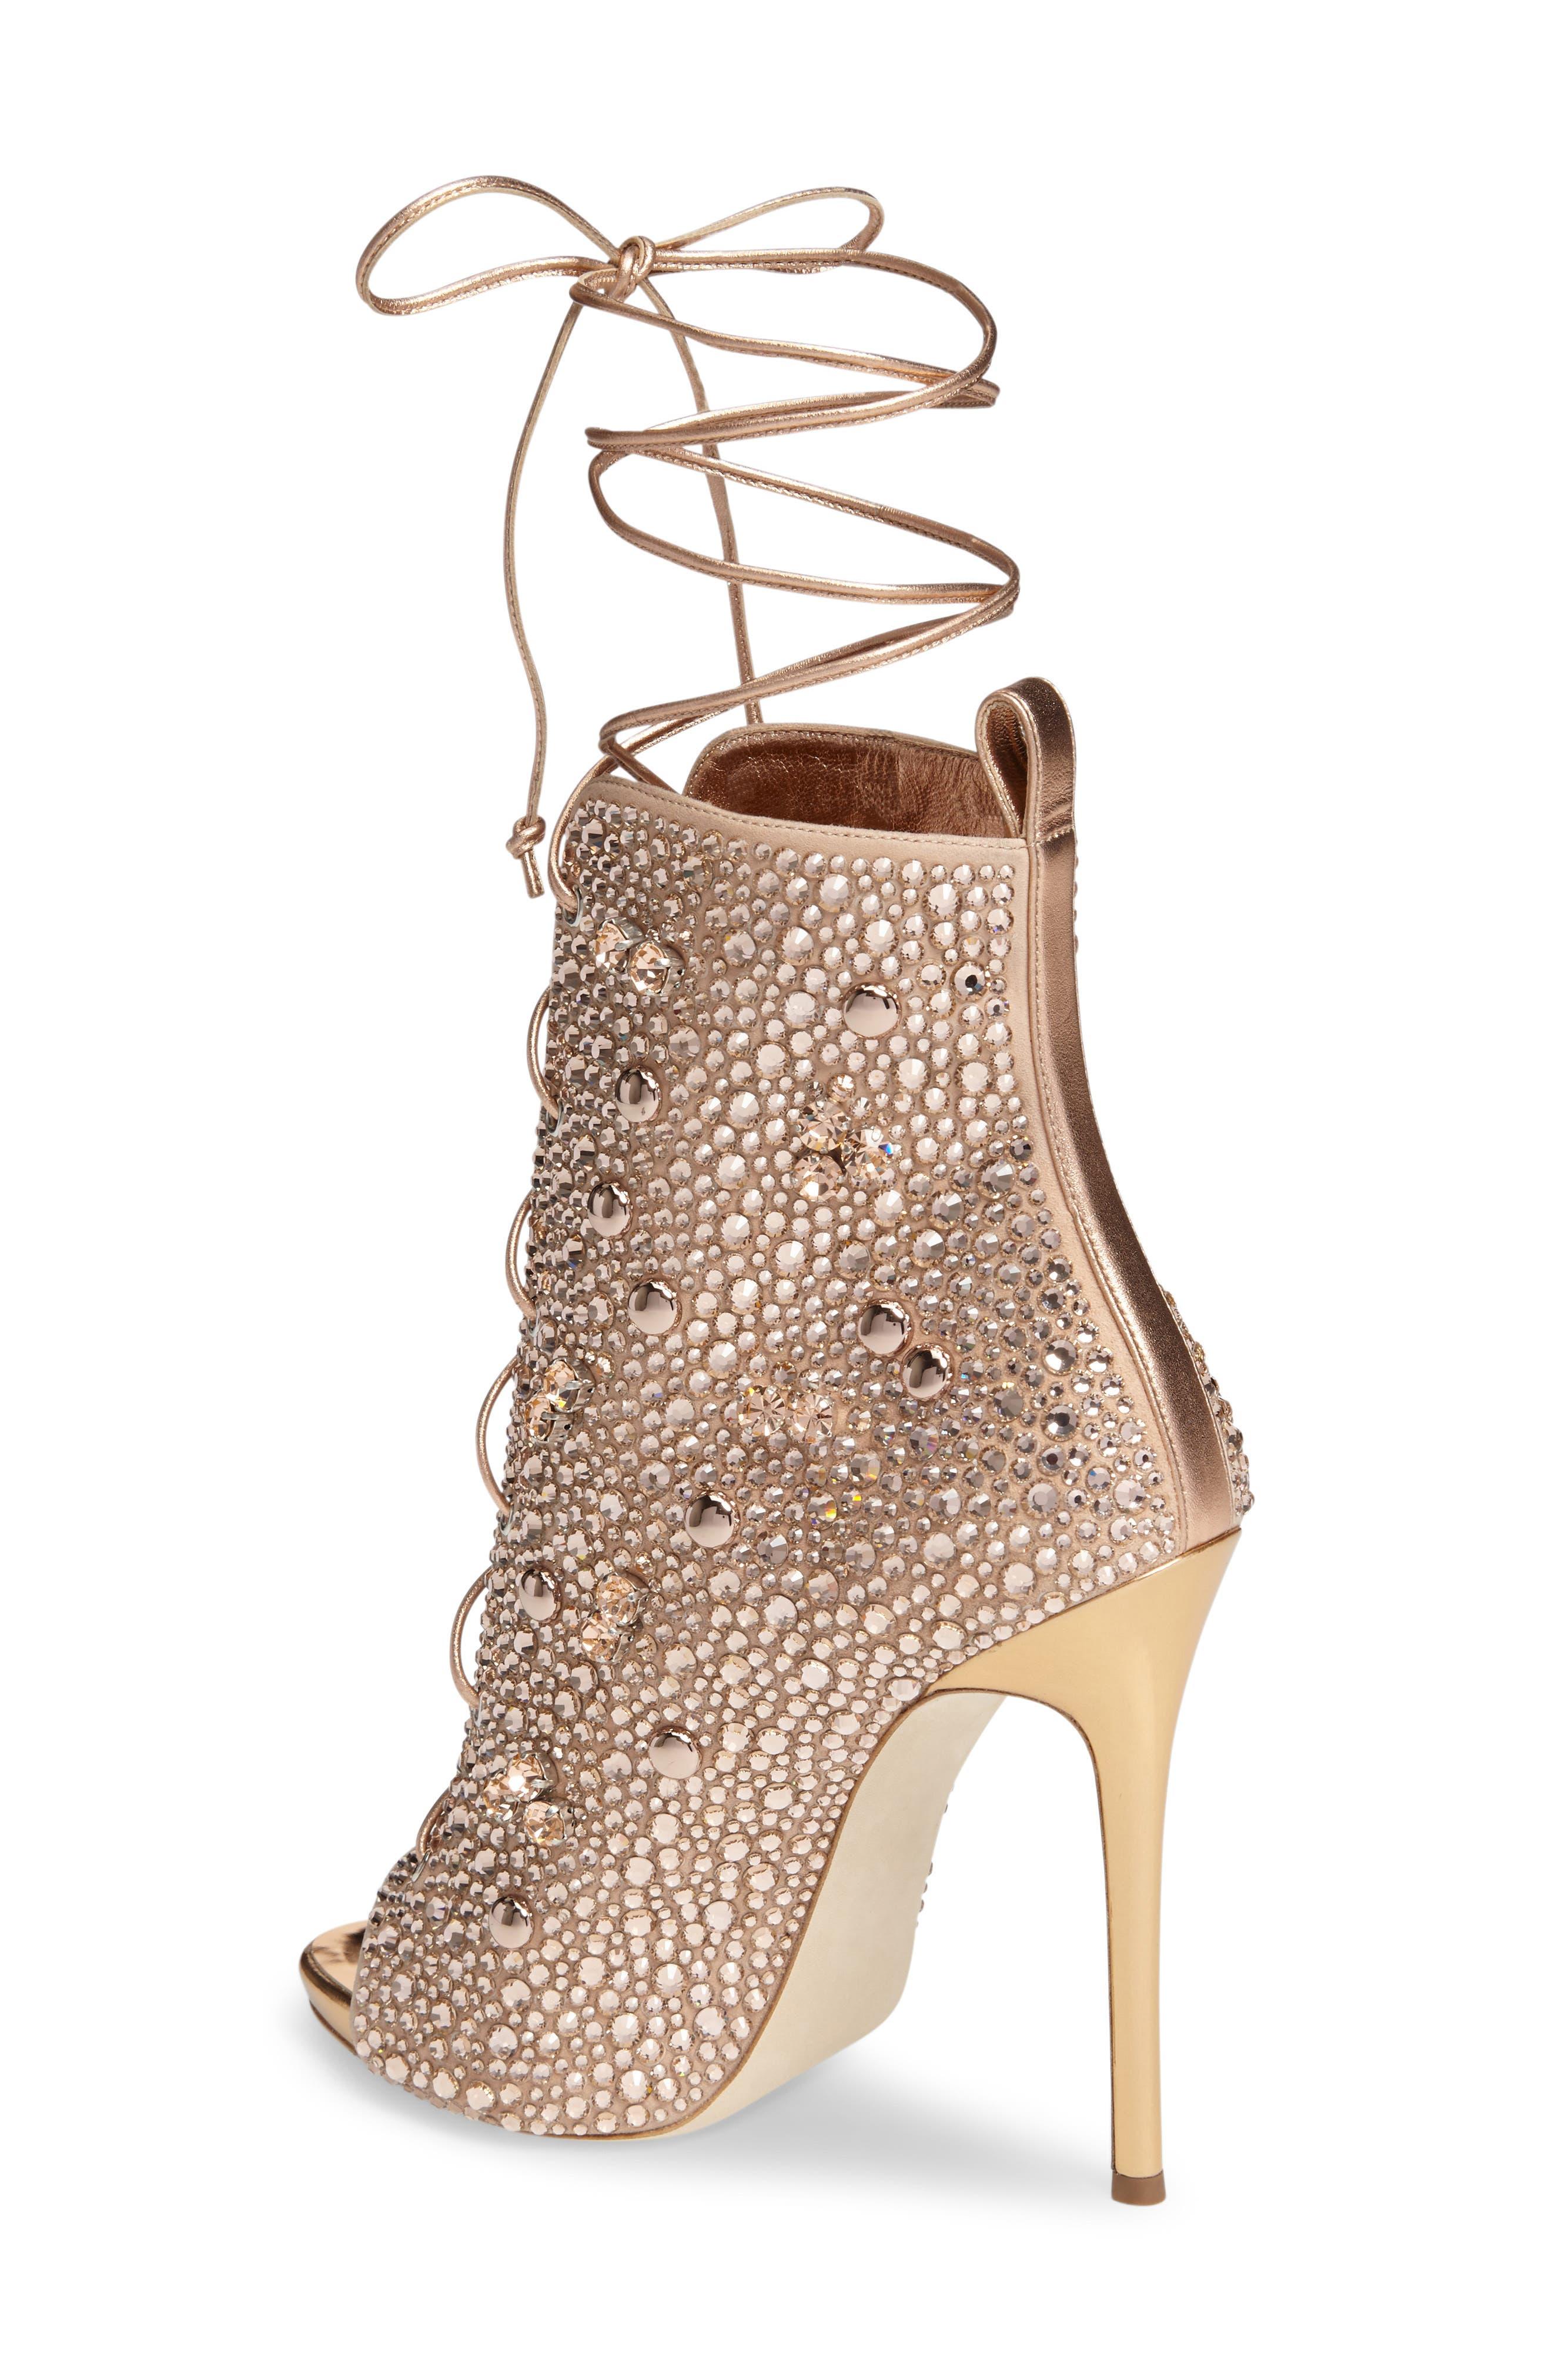 Giuseppe for Jennifer Lopez Lynda Embellished Lace-Up Sandal,                             Alternate thumbnail 2, color,                             710